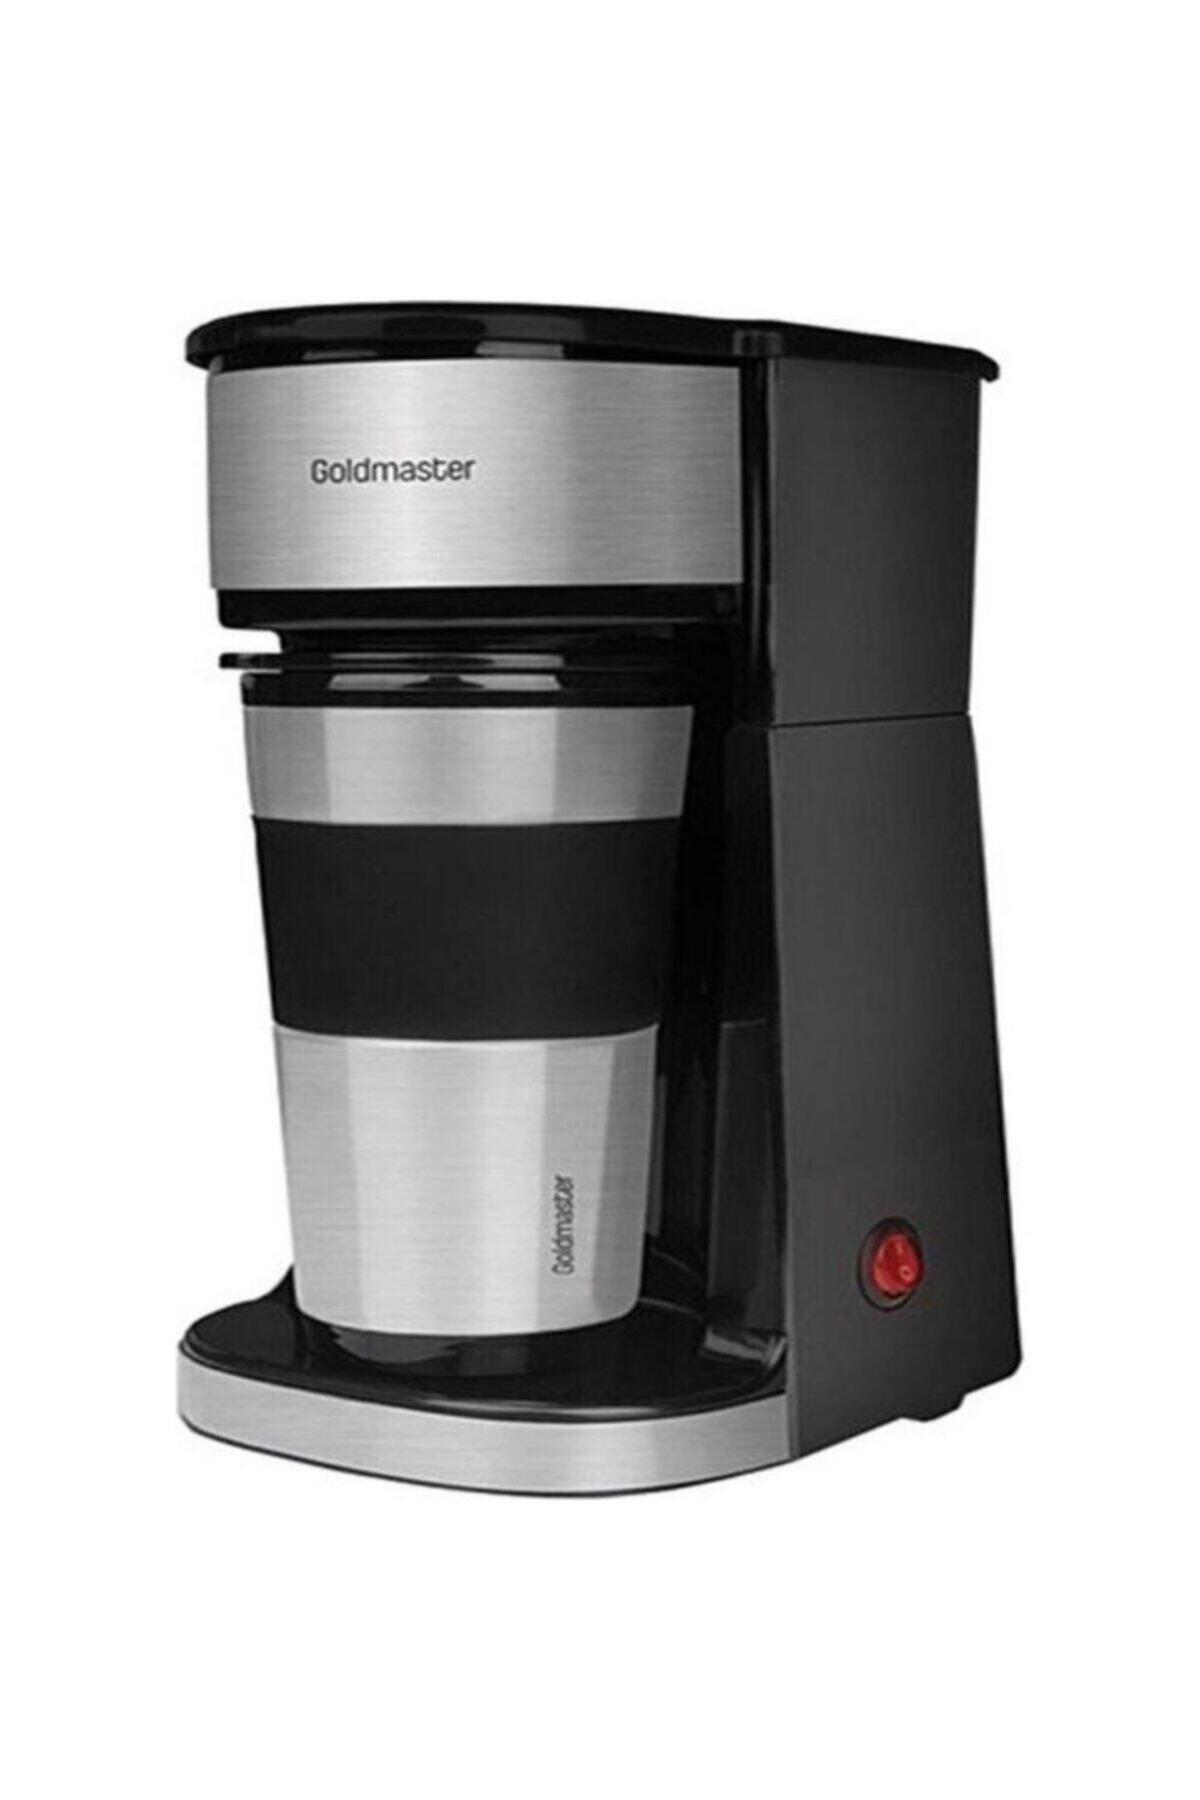 GOLDMASTER Gm 7351 Tutku Filtre Kahve Makinesi 1